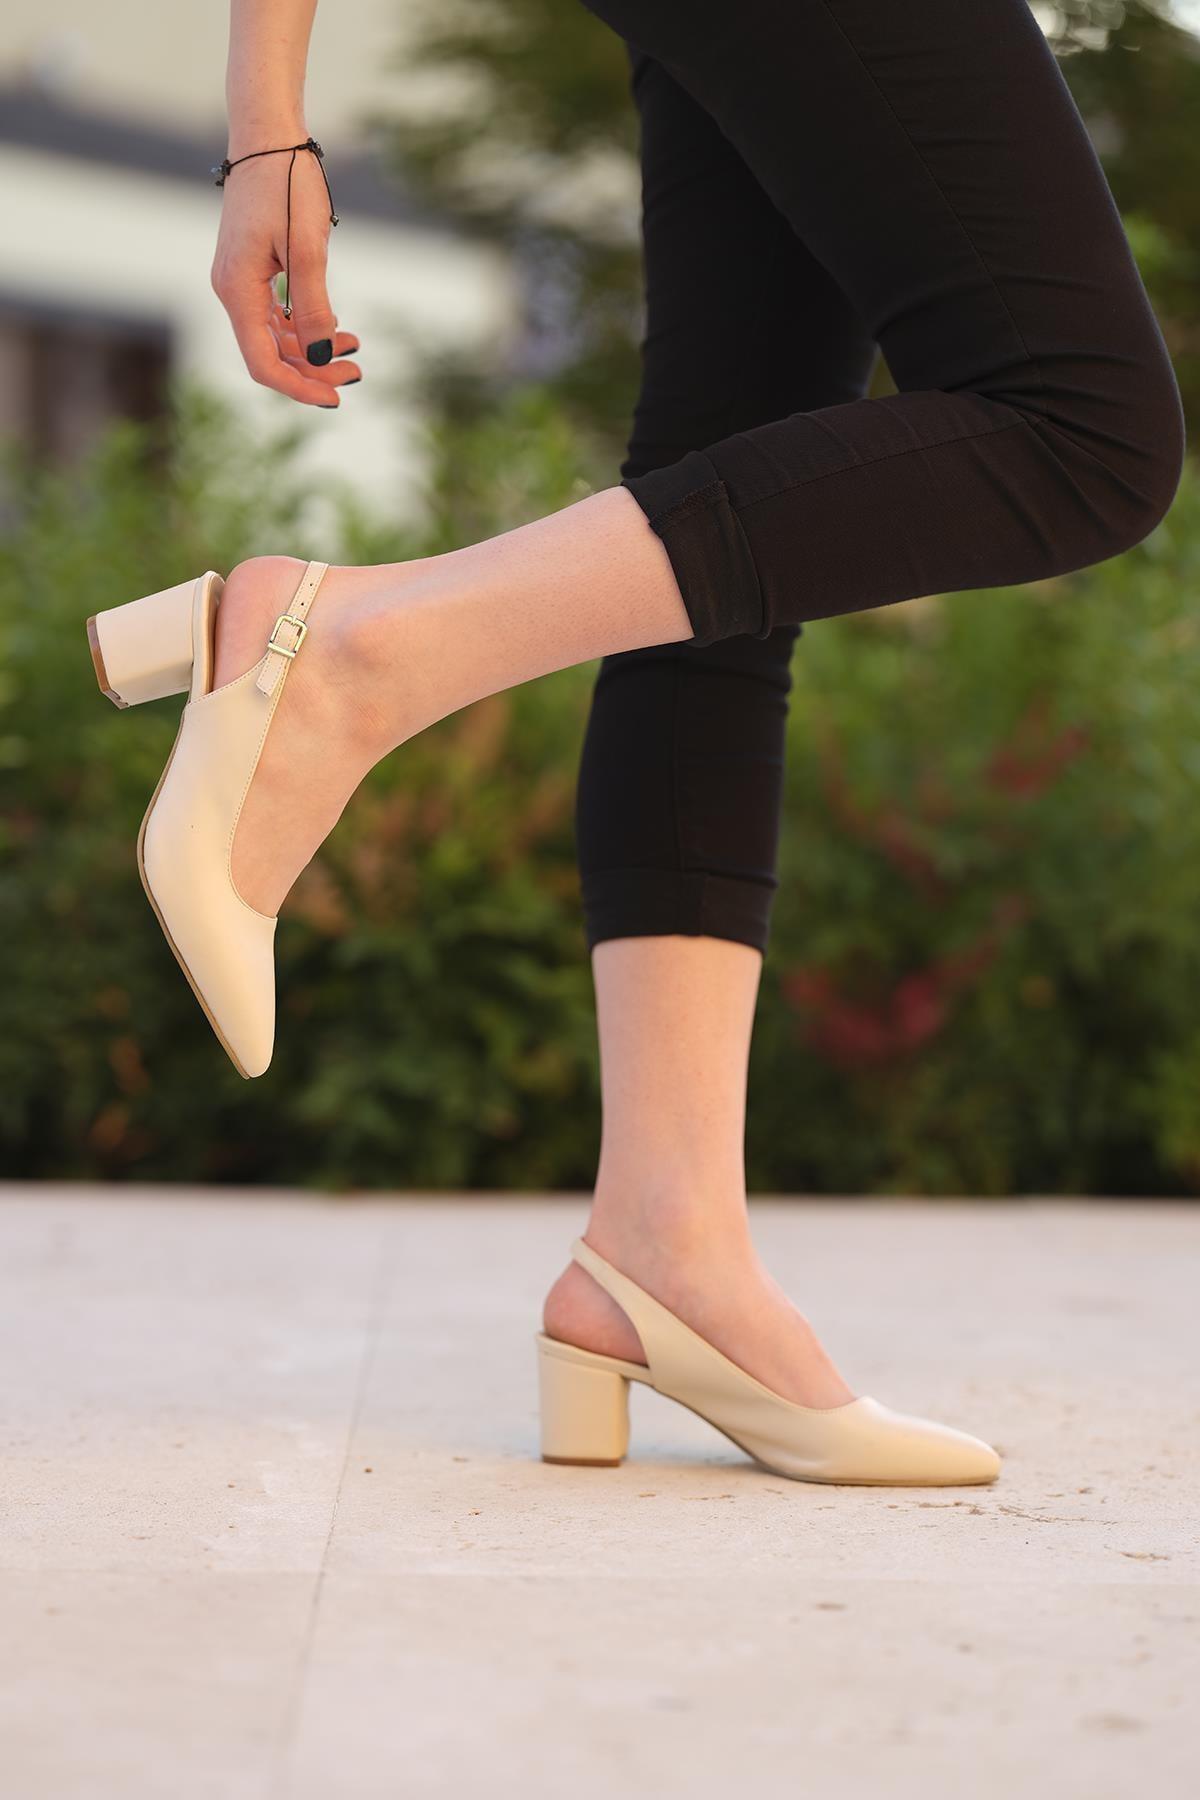 Oksit Giyim Florin Emma Toka Detaylı Topuklu Ayakkabı